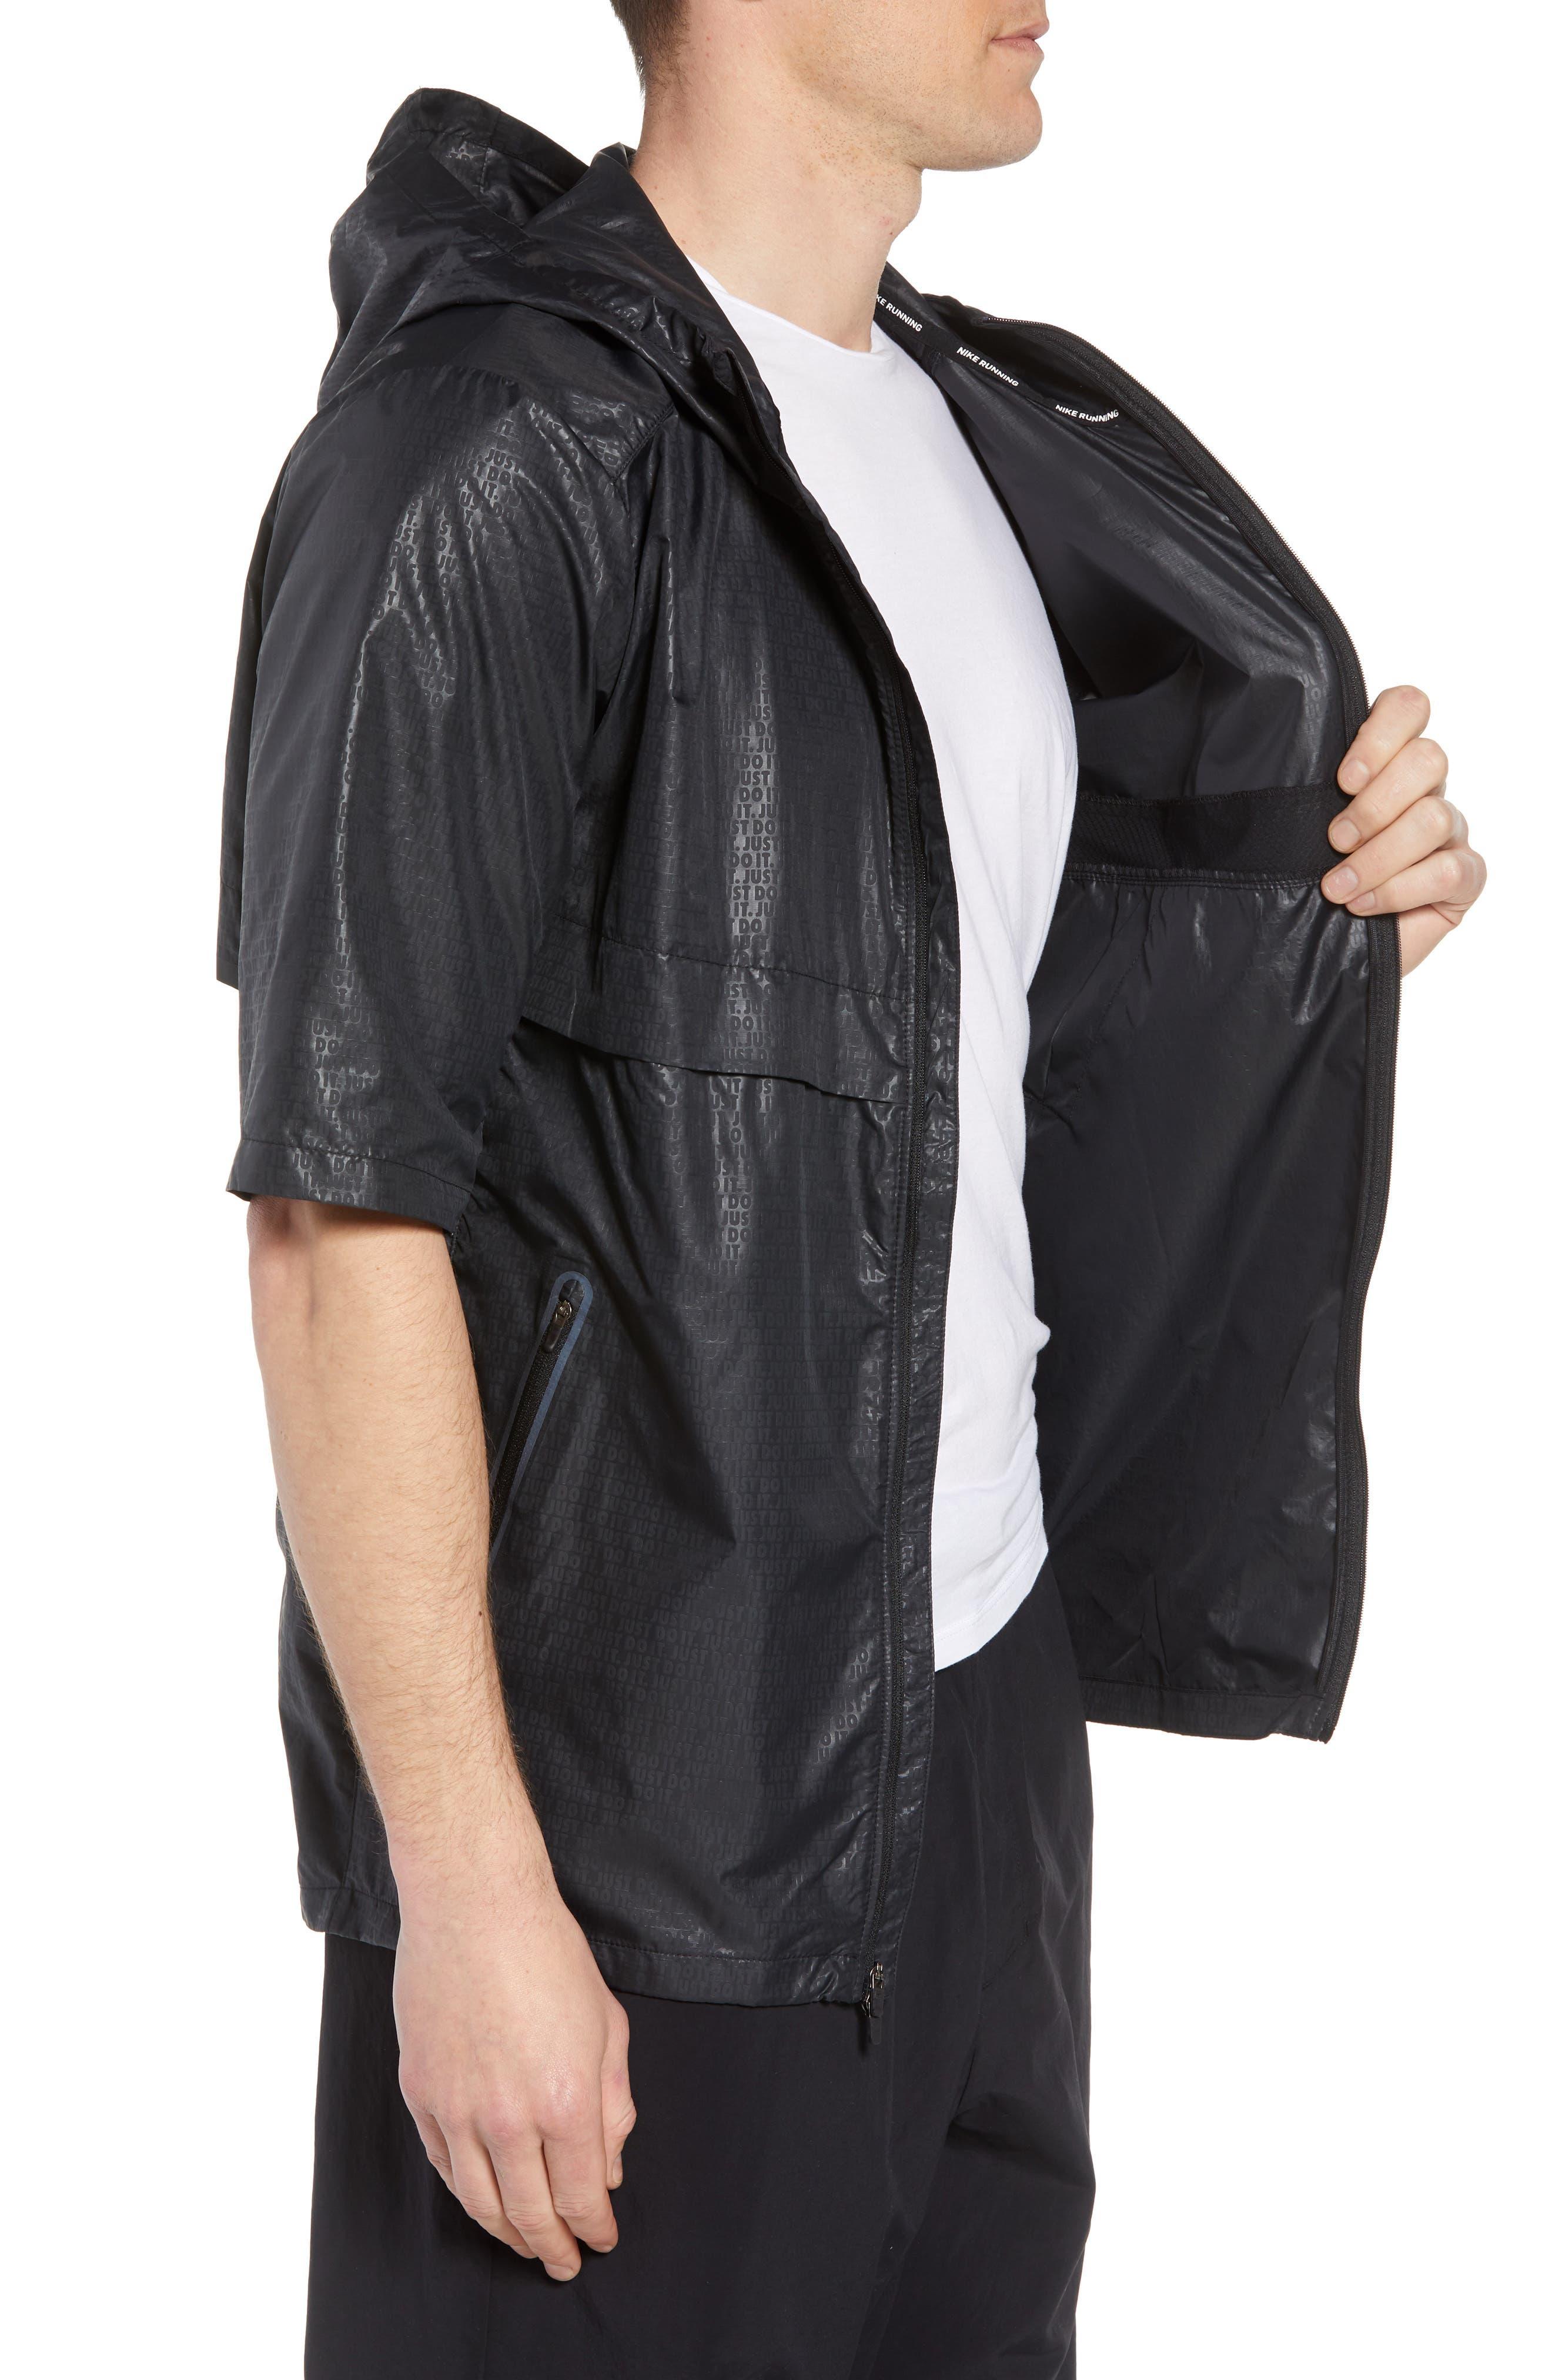 Running Shield Short Sleeve Hooded Jacket,                             Alternate thumbnail 3, color,                             BLACK